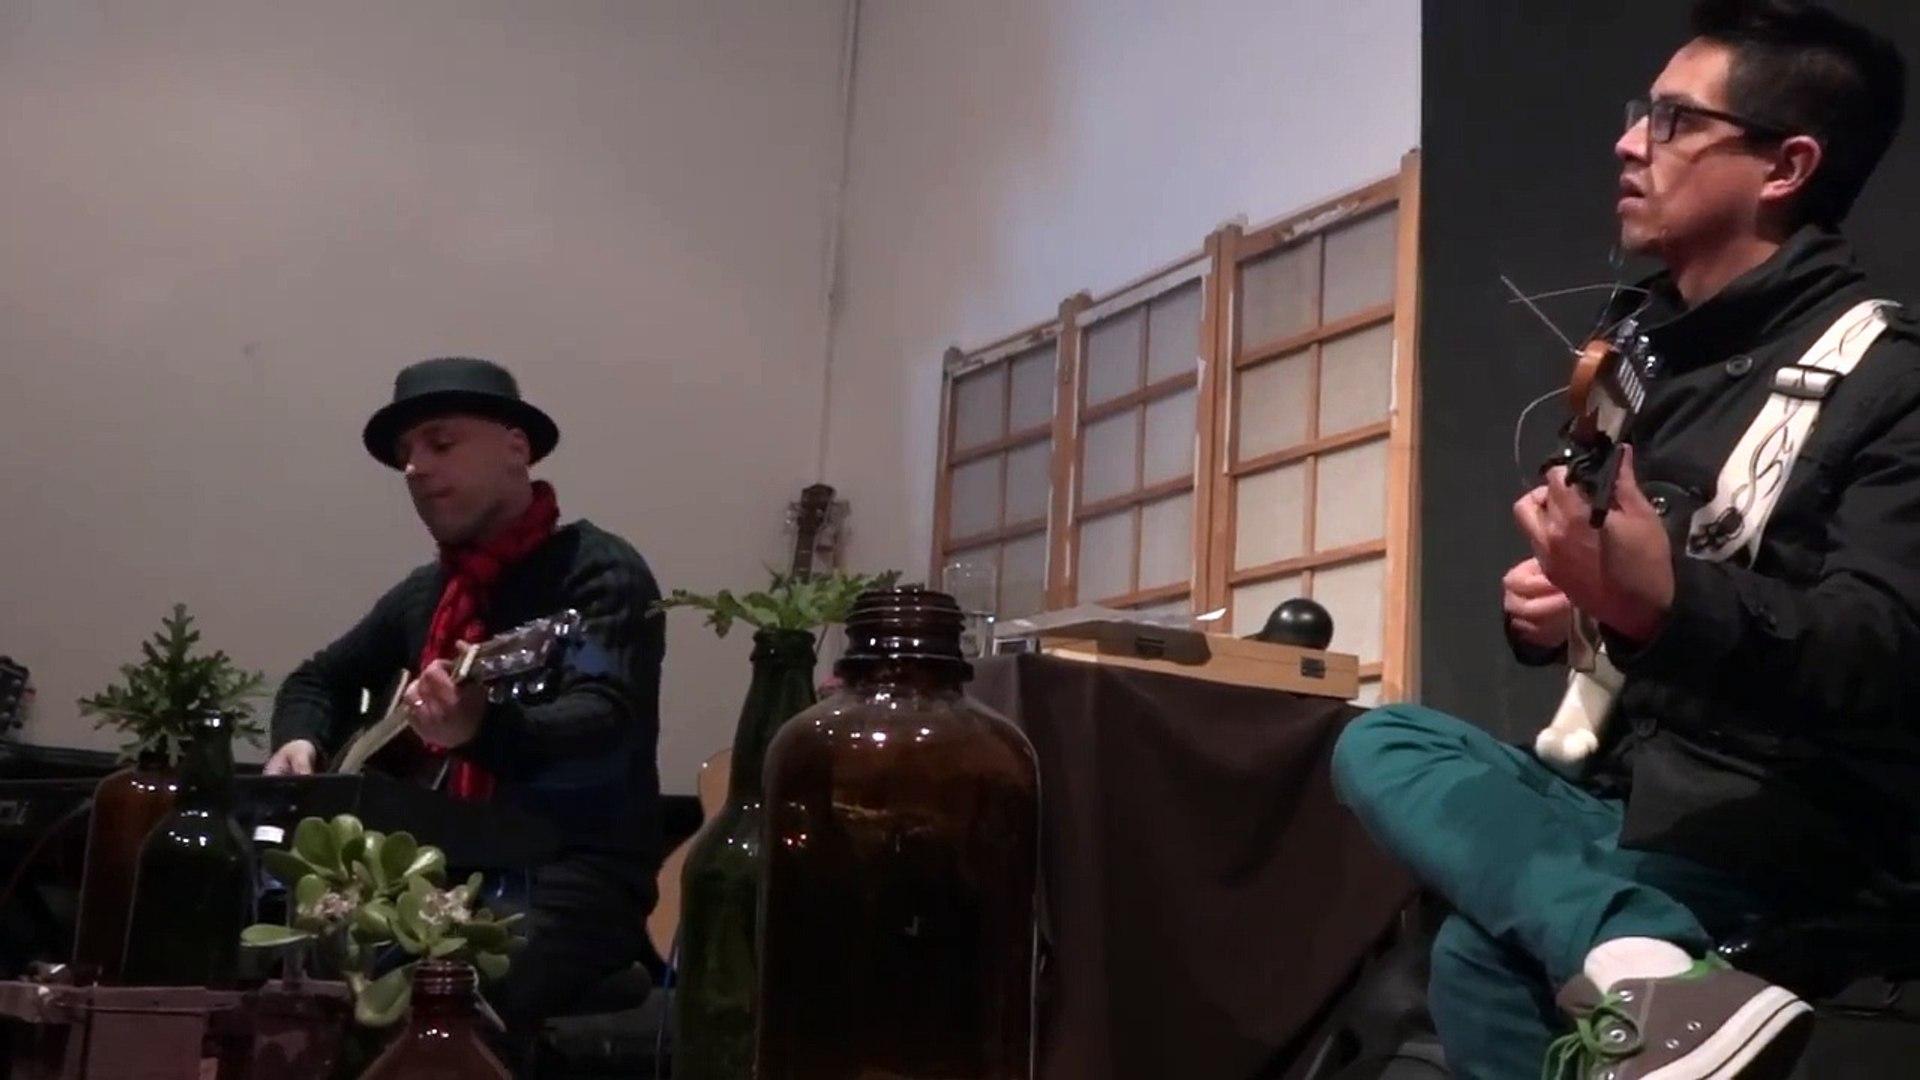 Jony Calleja - (Ciclo Alrededor de la Fogata, 25-07-2014)